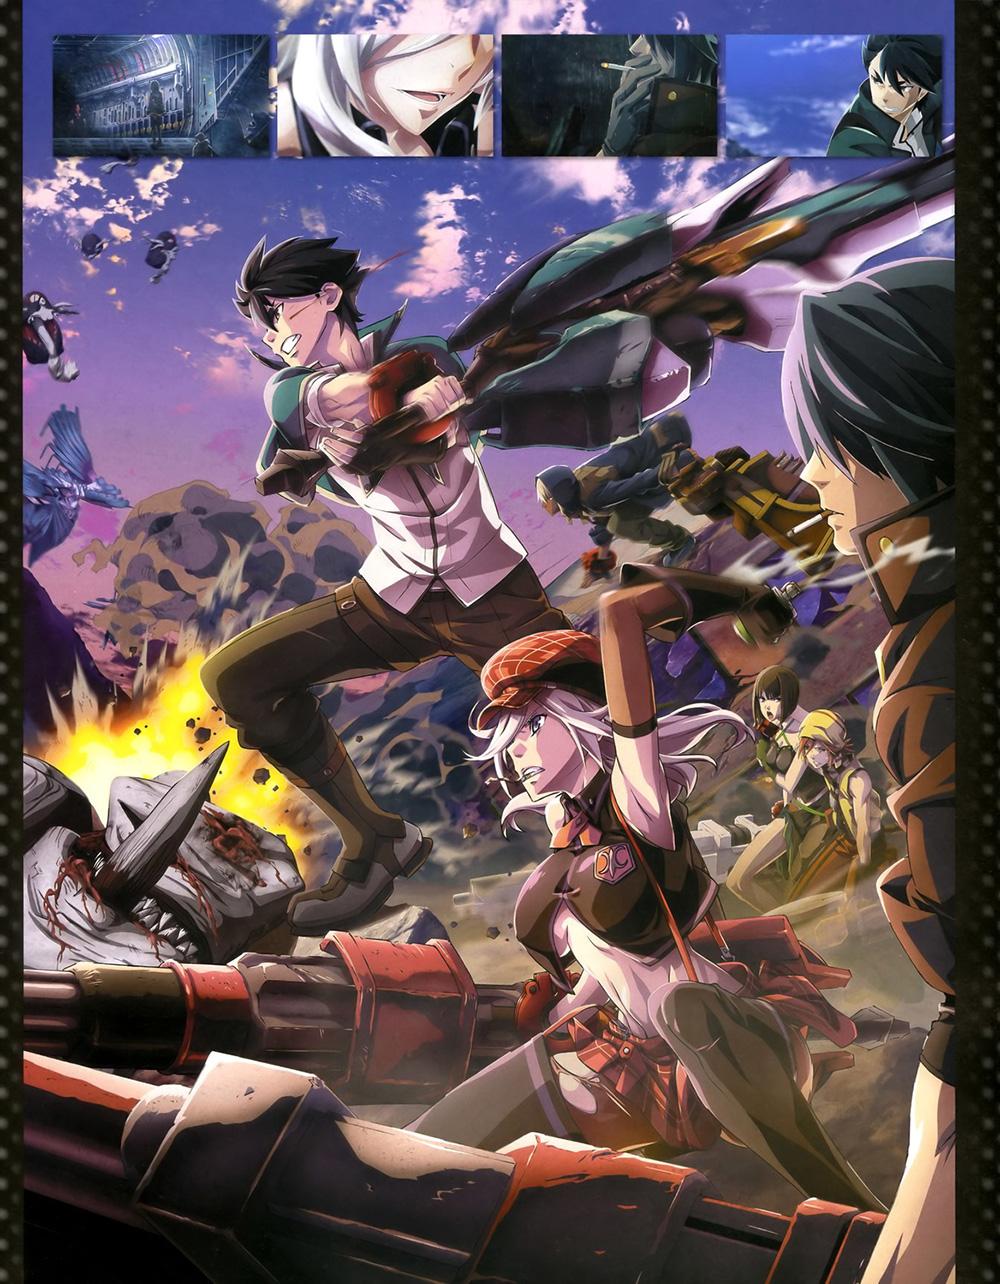 Charapedia-Top-20-Anticipated-Anime-of-Summer-2015-Rank-15-God-Eater